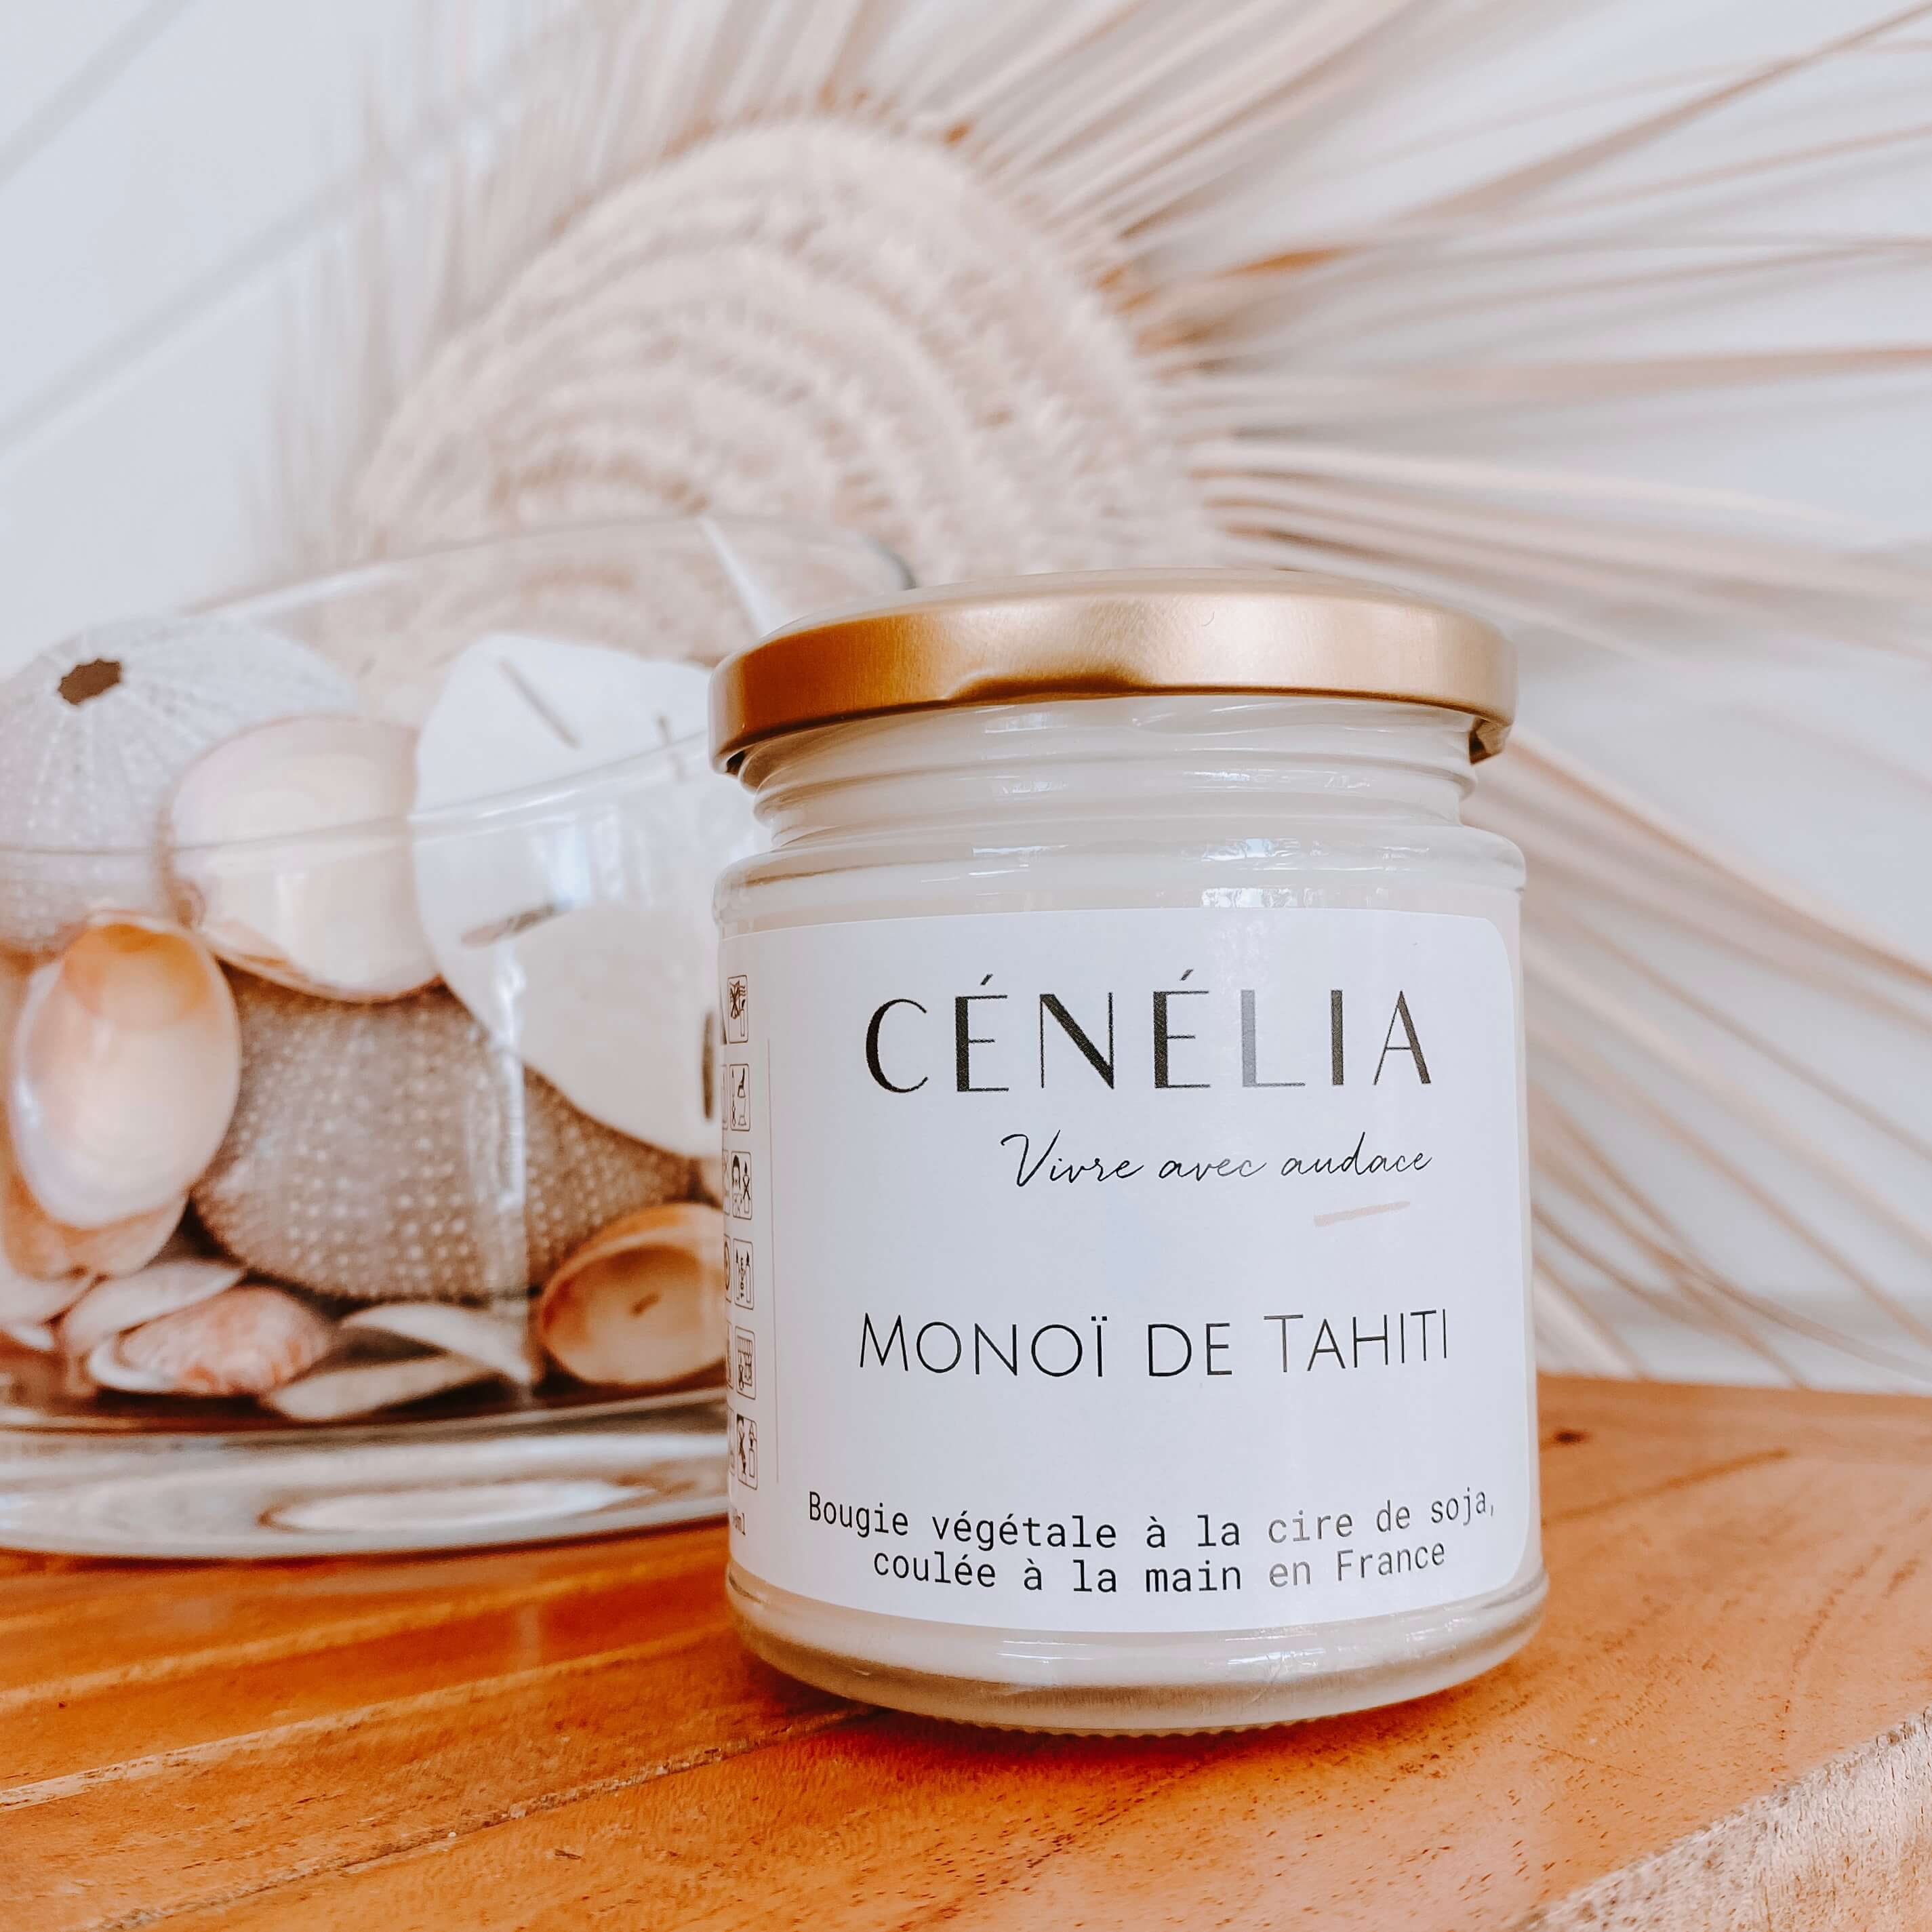 bougie vegan au monoï - bougie naturelle parfum monoï Cénélia